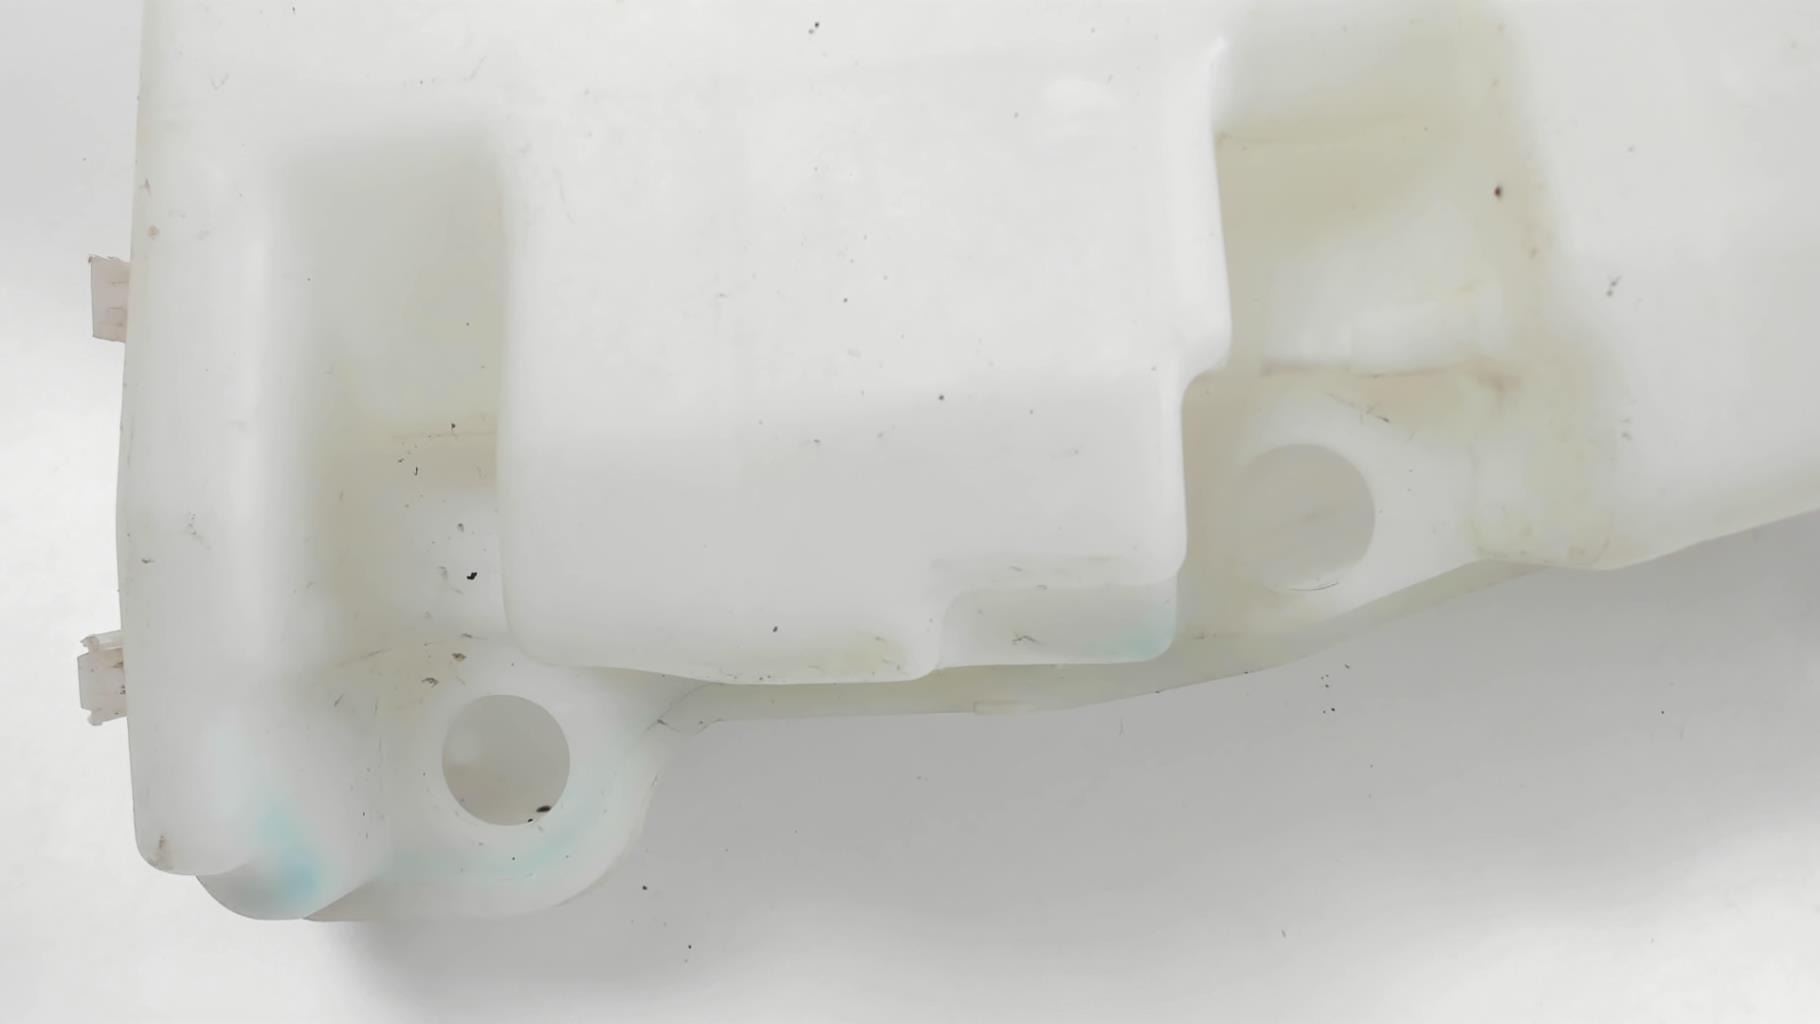 Image Vase de lave glace - HYUNDAI TERRACAN